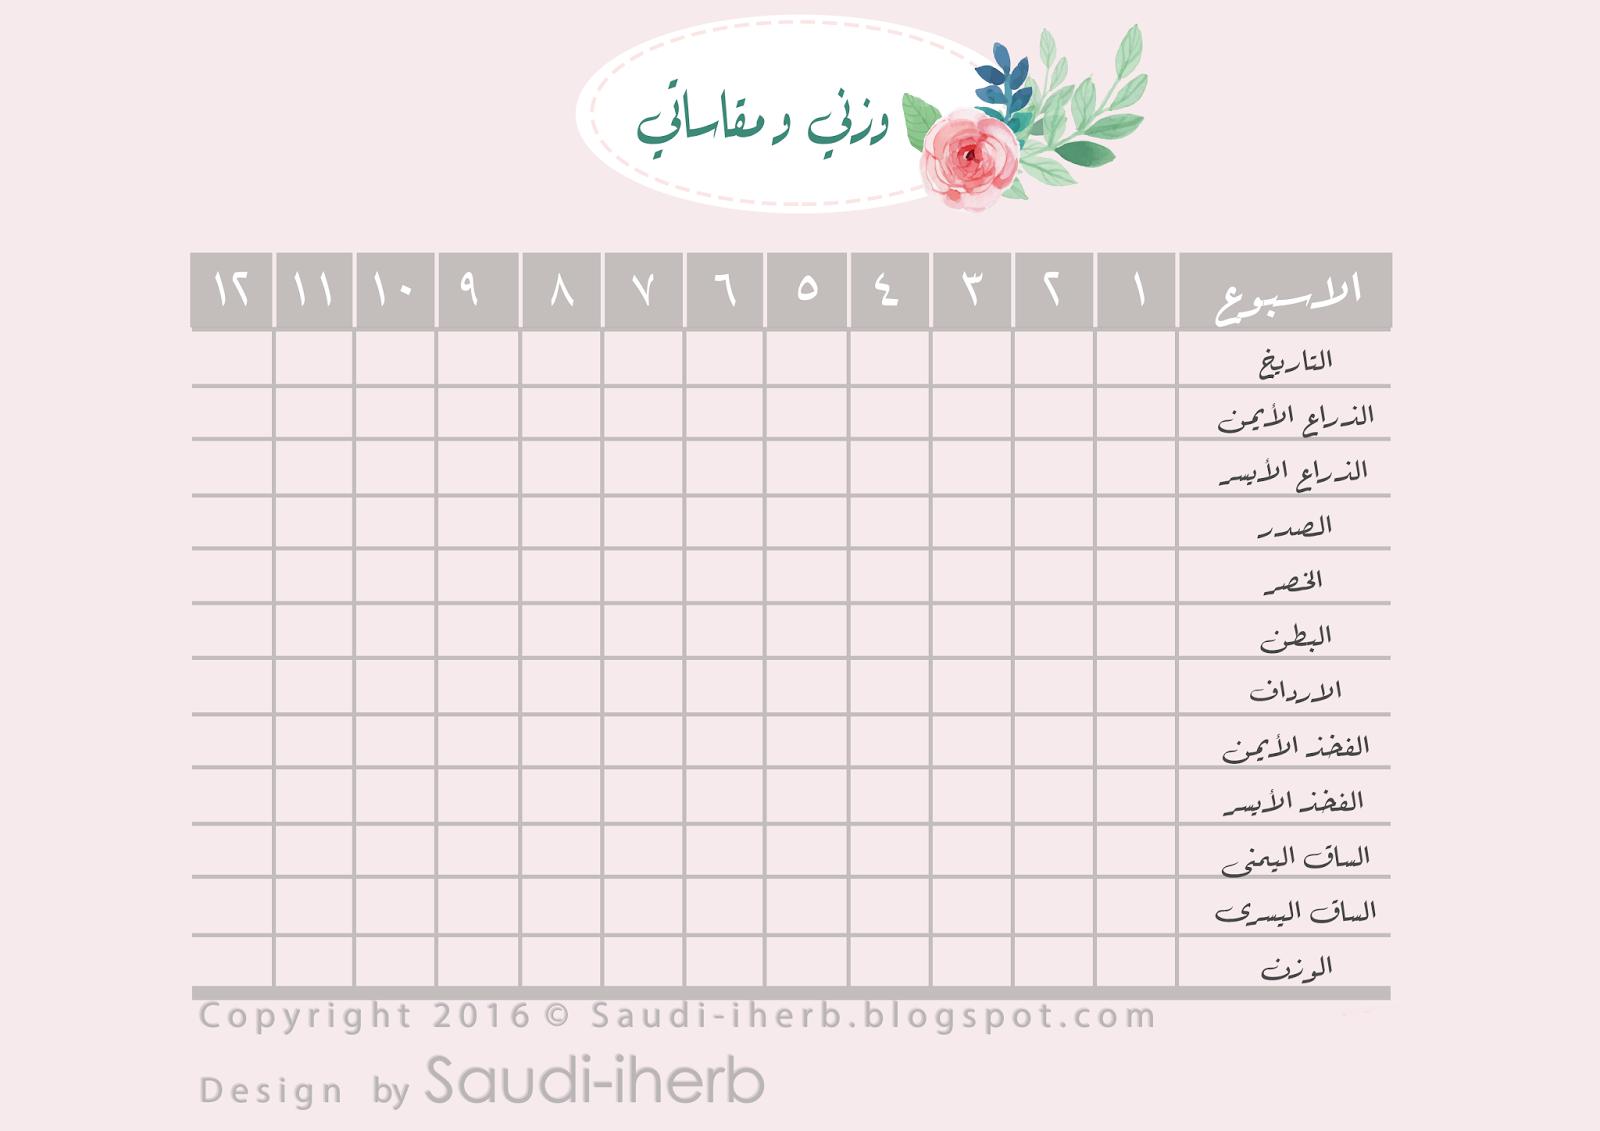 b197a0cf5 جدول لمتابعة الوزن و المقاسات | Happy | Weekly planner, Printable ...